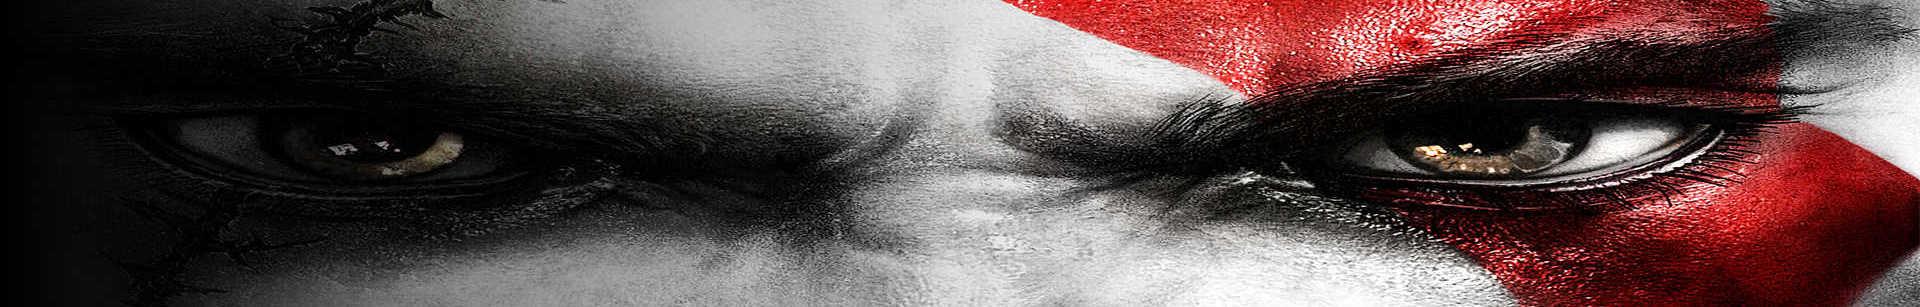 Kratos_堡叔 banner